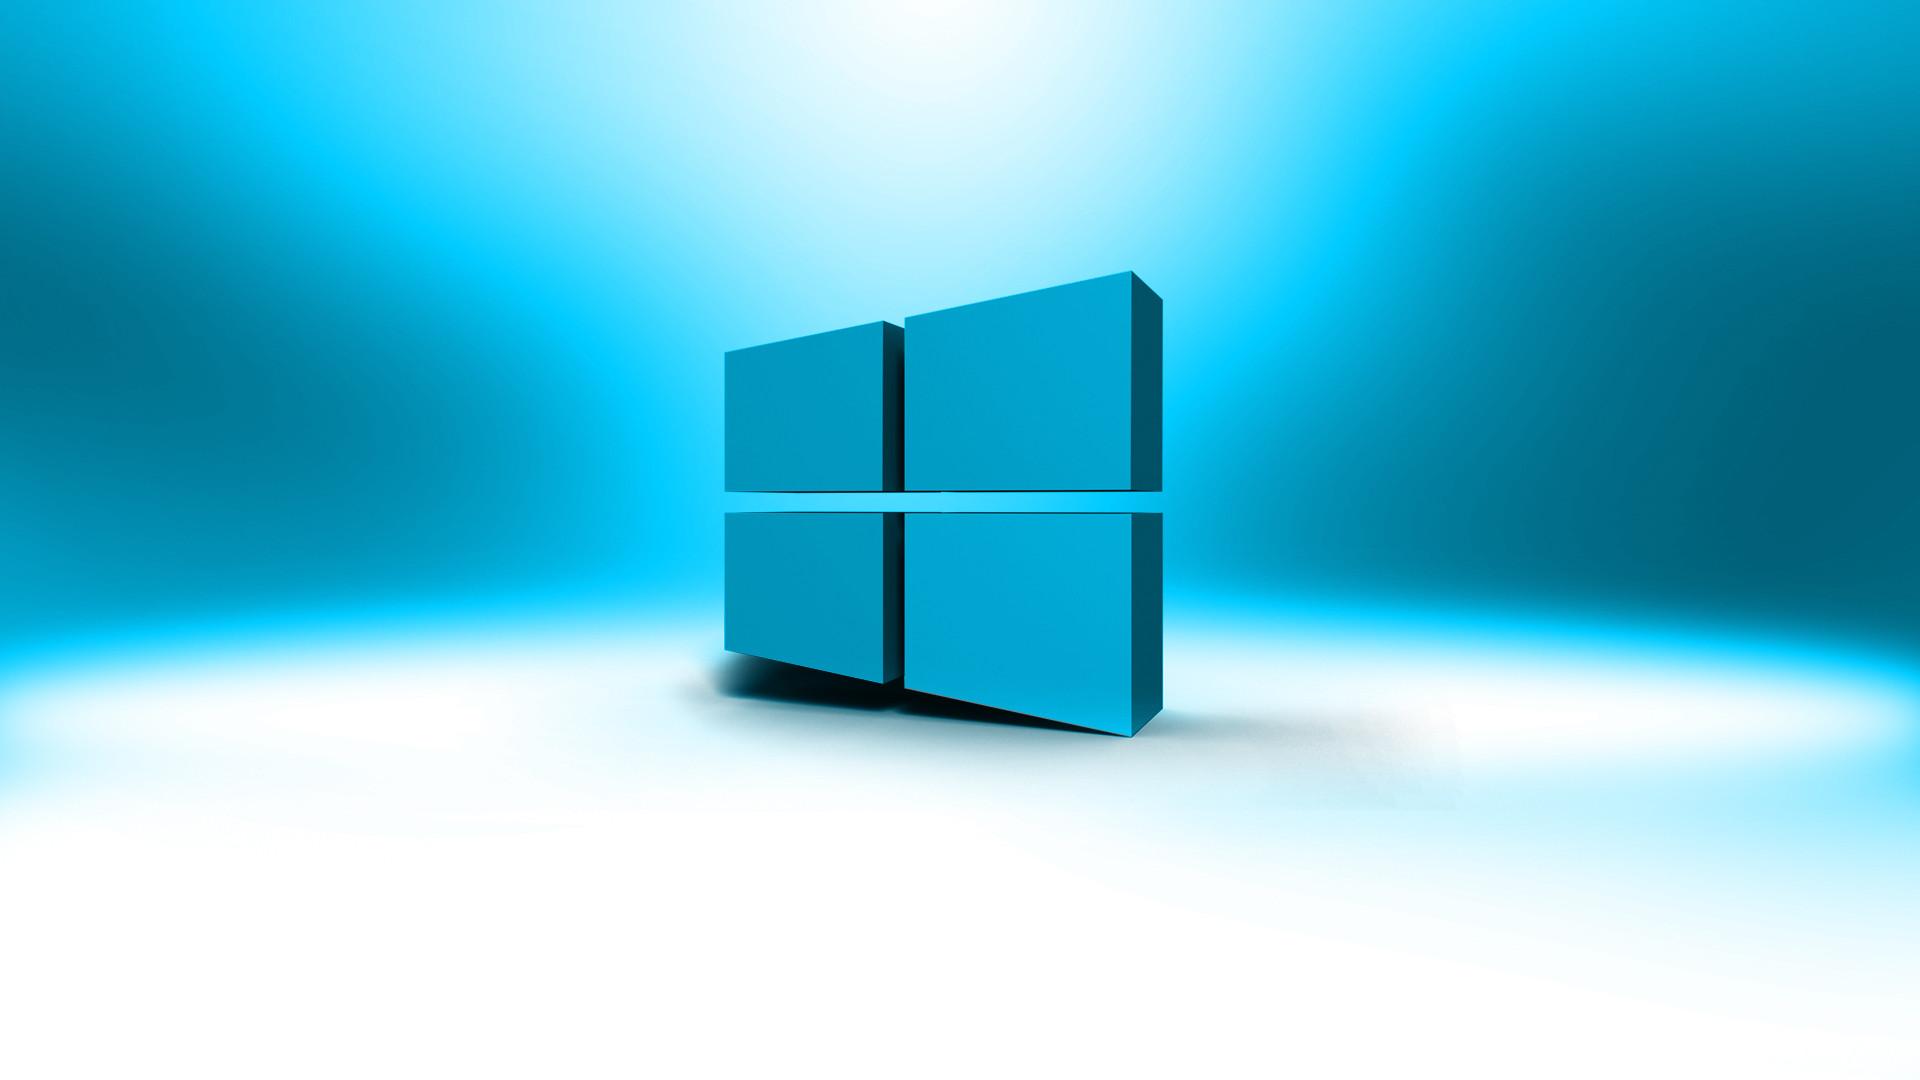 Res: 1920x1080, Microsoft Windows 10 3D wallpaper.